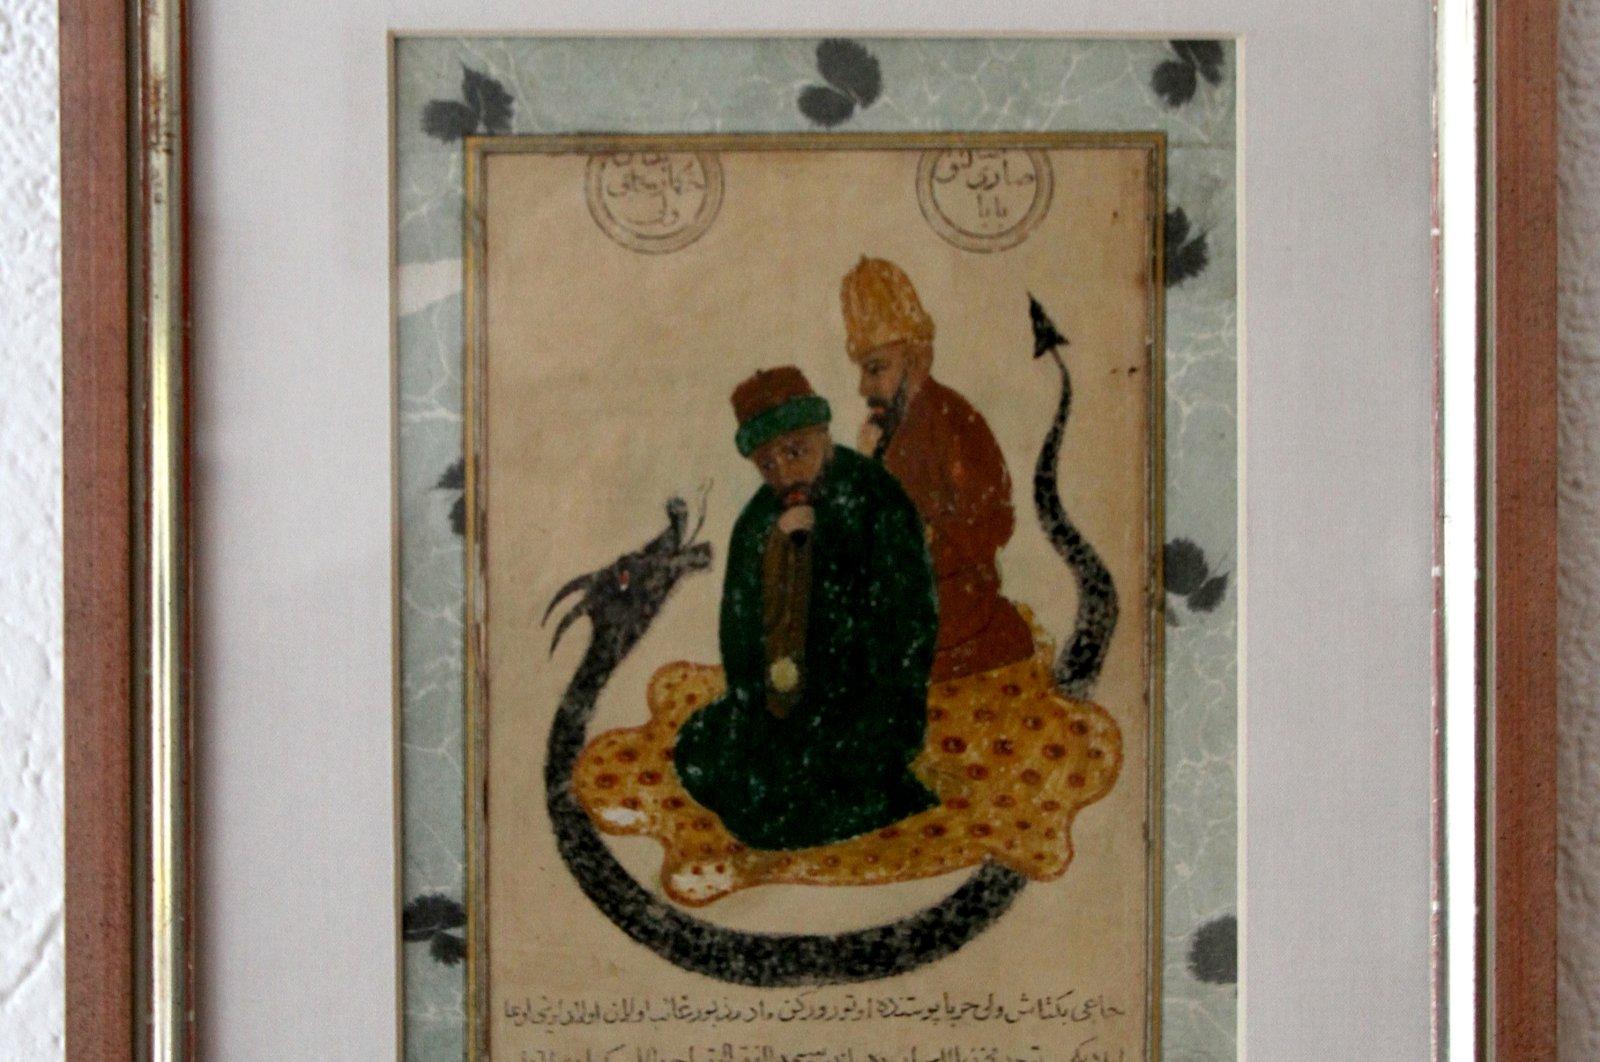 The painting depicting Haji Bektash Veli with Sarı Saltuk Baba is 22 by 17 centimeters. (AA Photo)